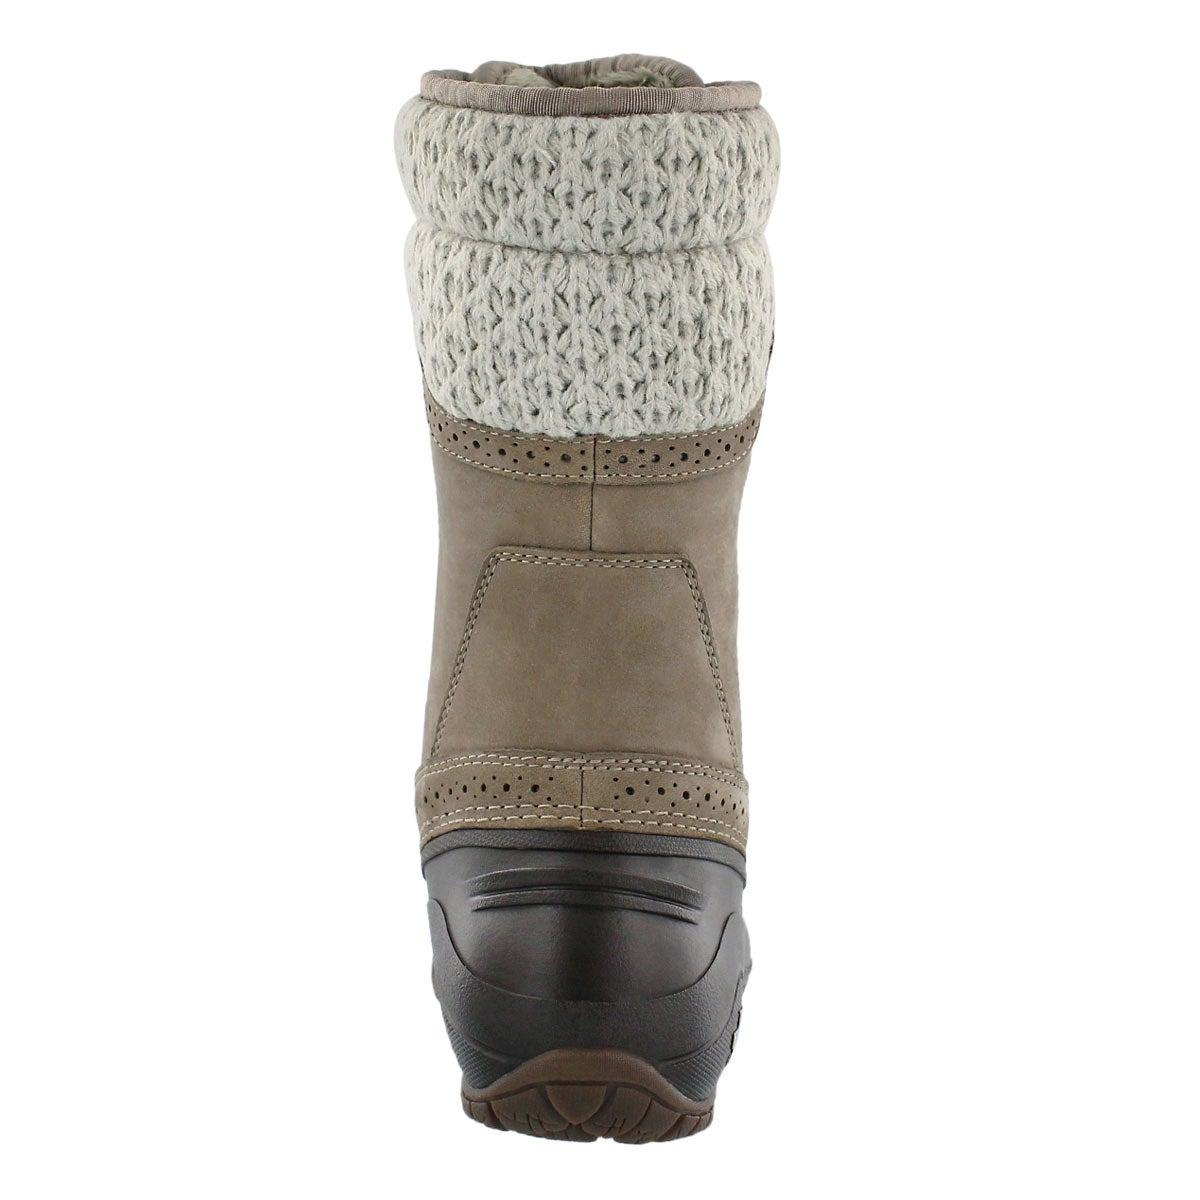 Lds Shellista II Mid brown wntr boot